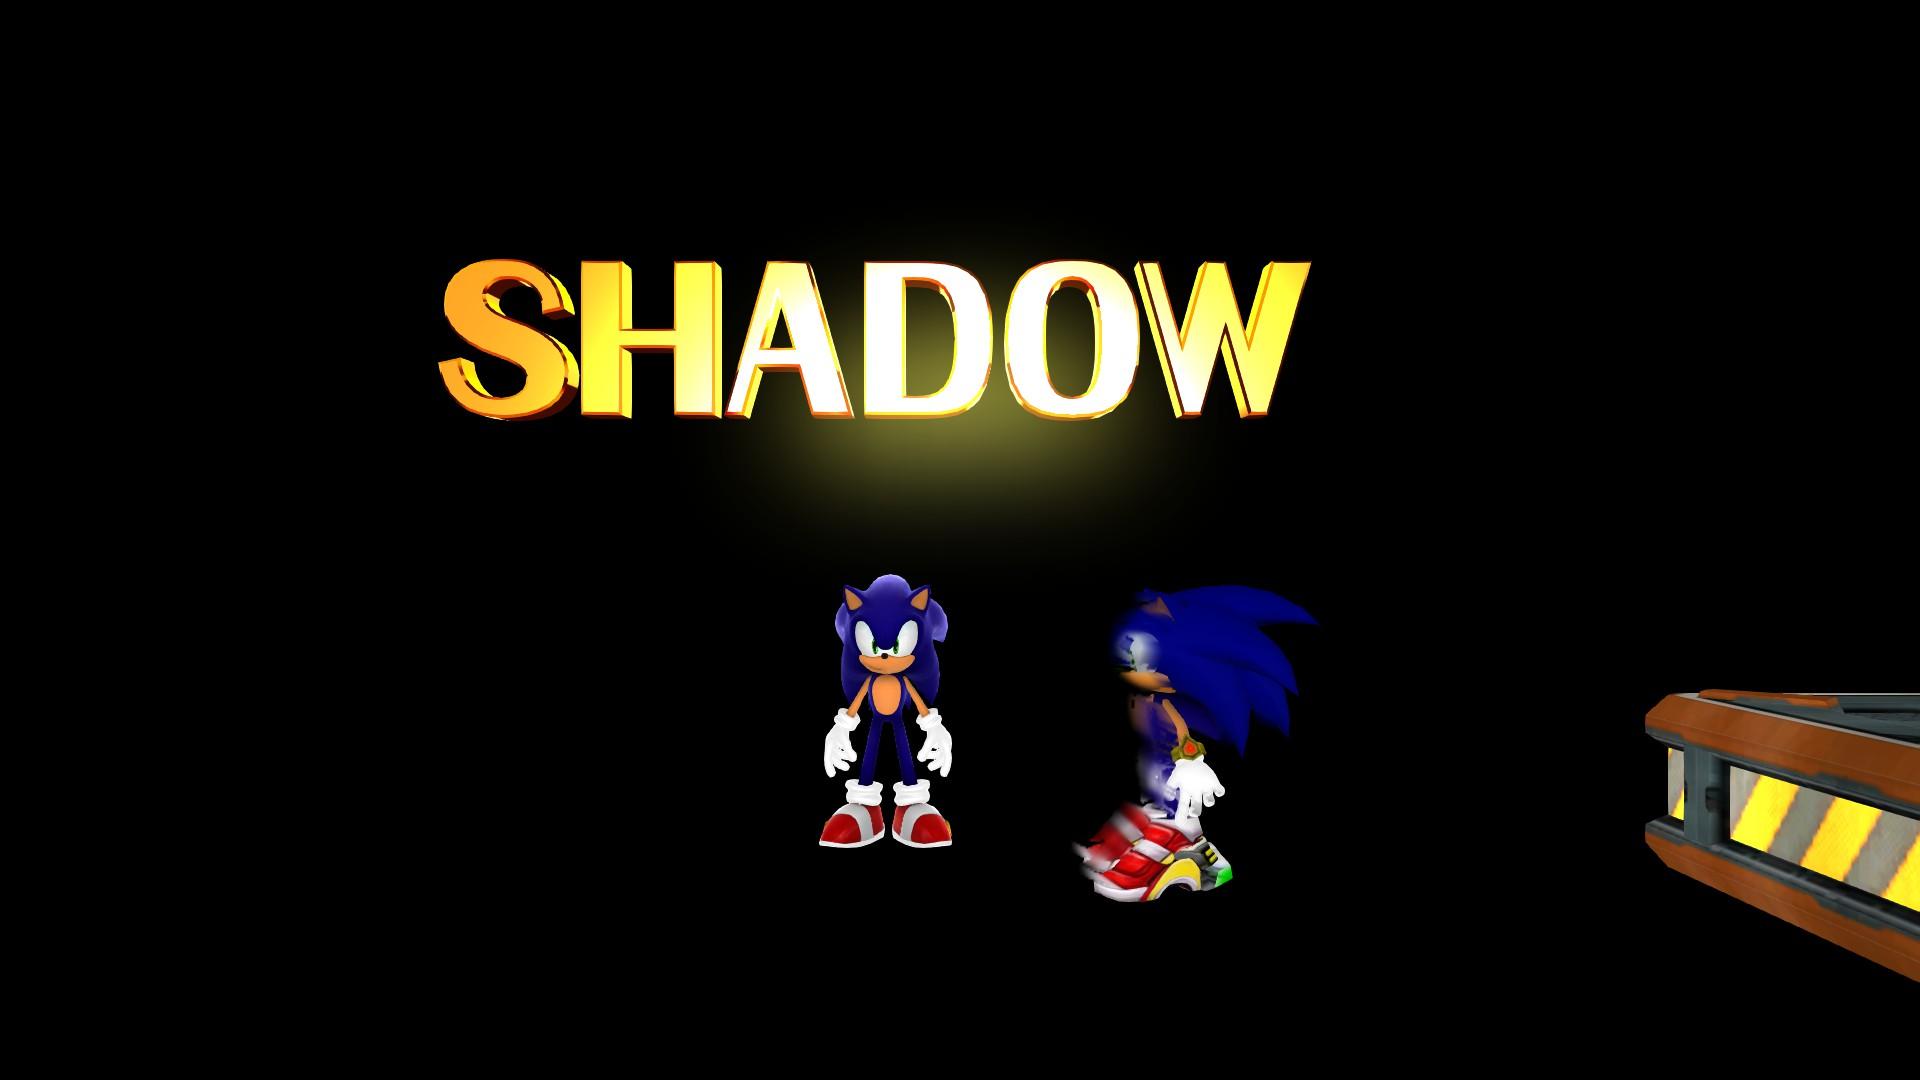 Sonic Adventure 2 Sonic Vs Modern Sonic image - Mod DB